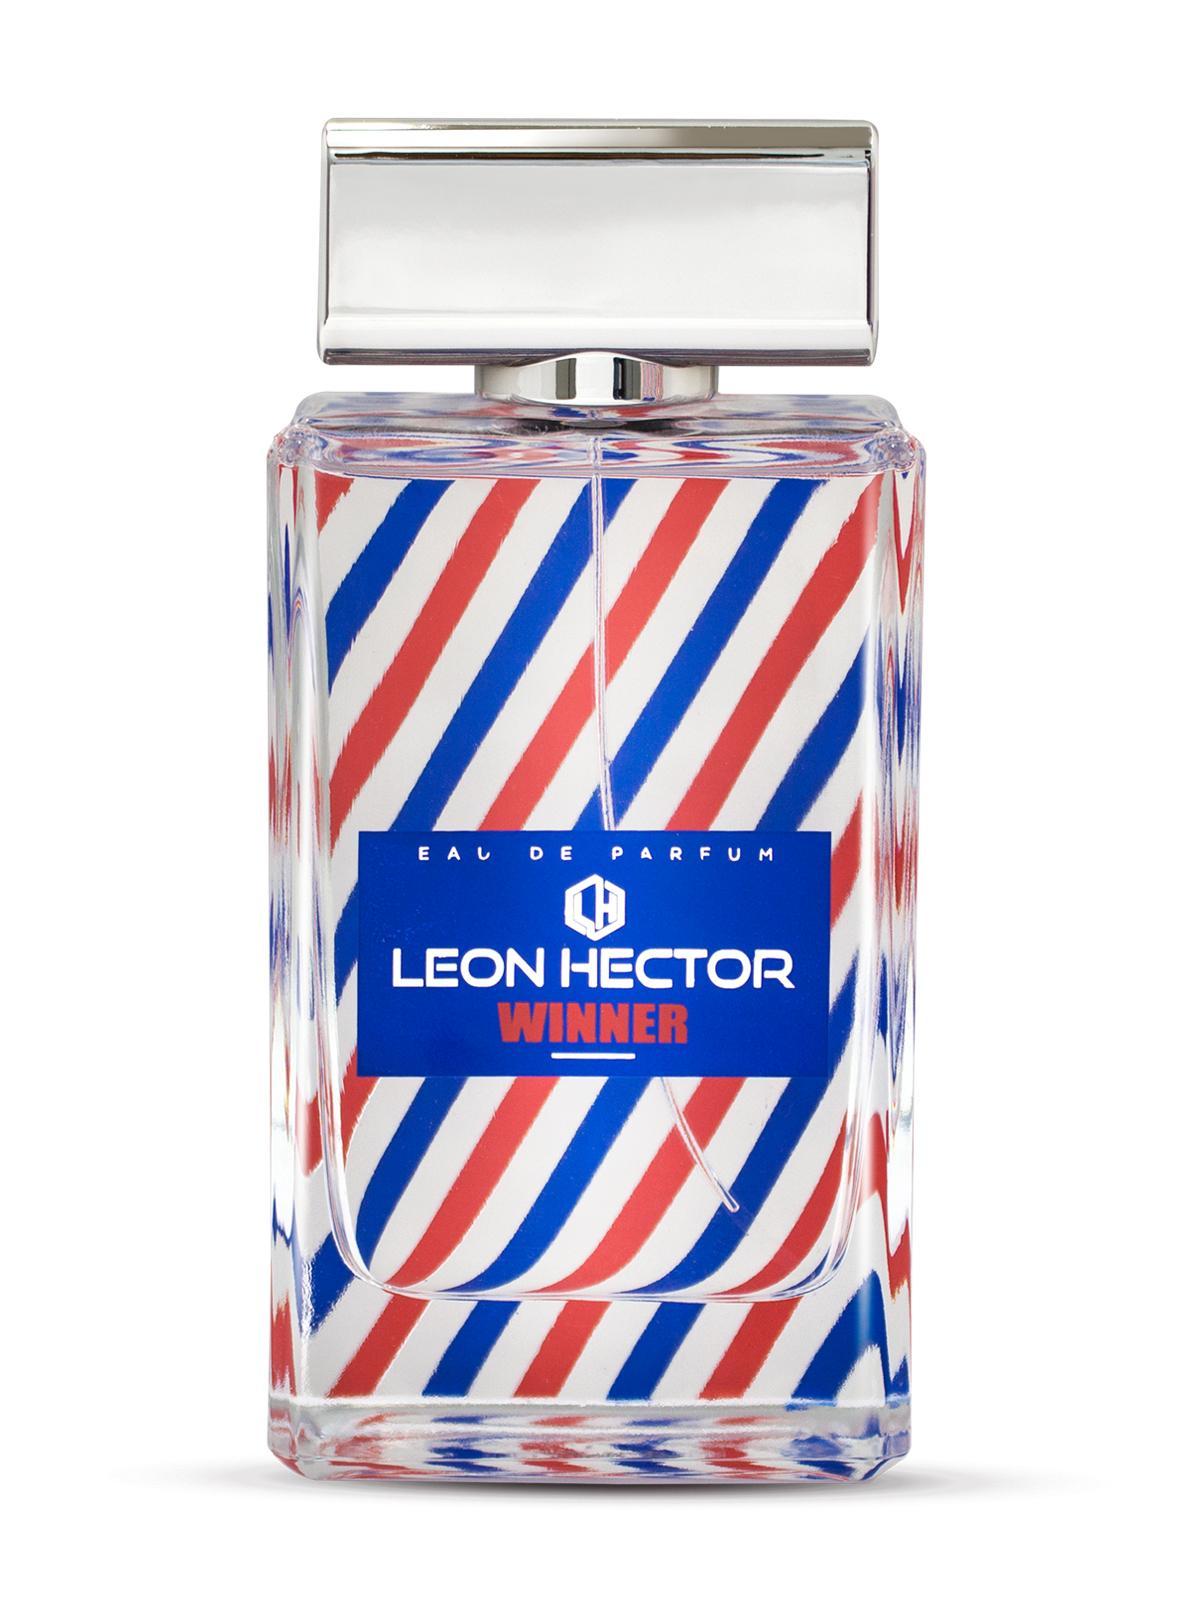 Leon Hector Winner for unisex eau de parfum 100ML